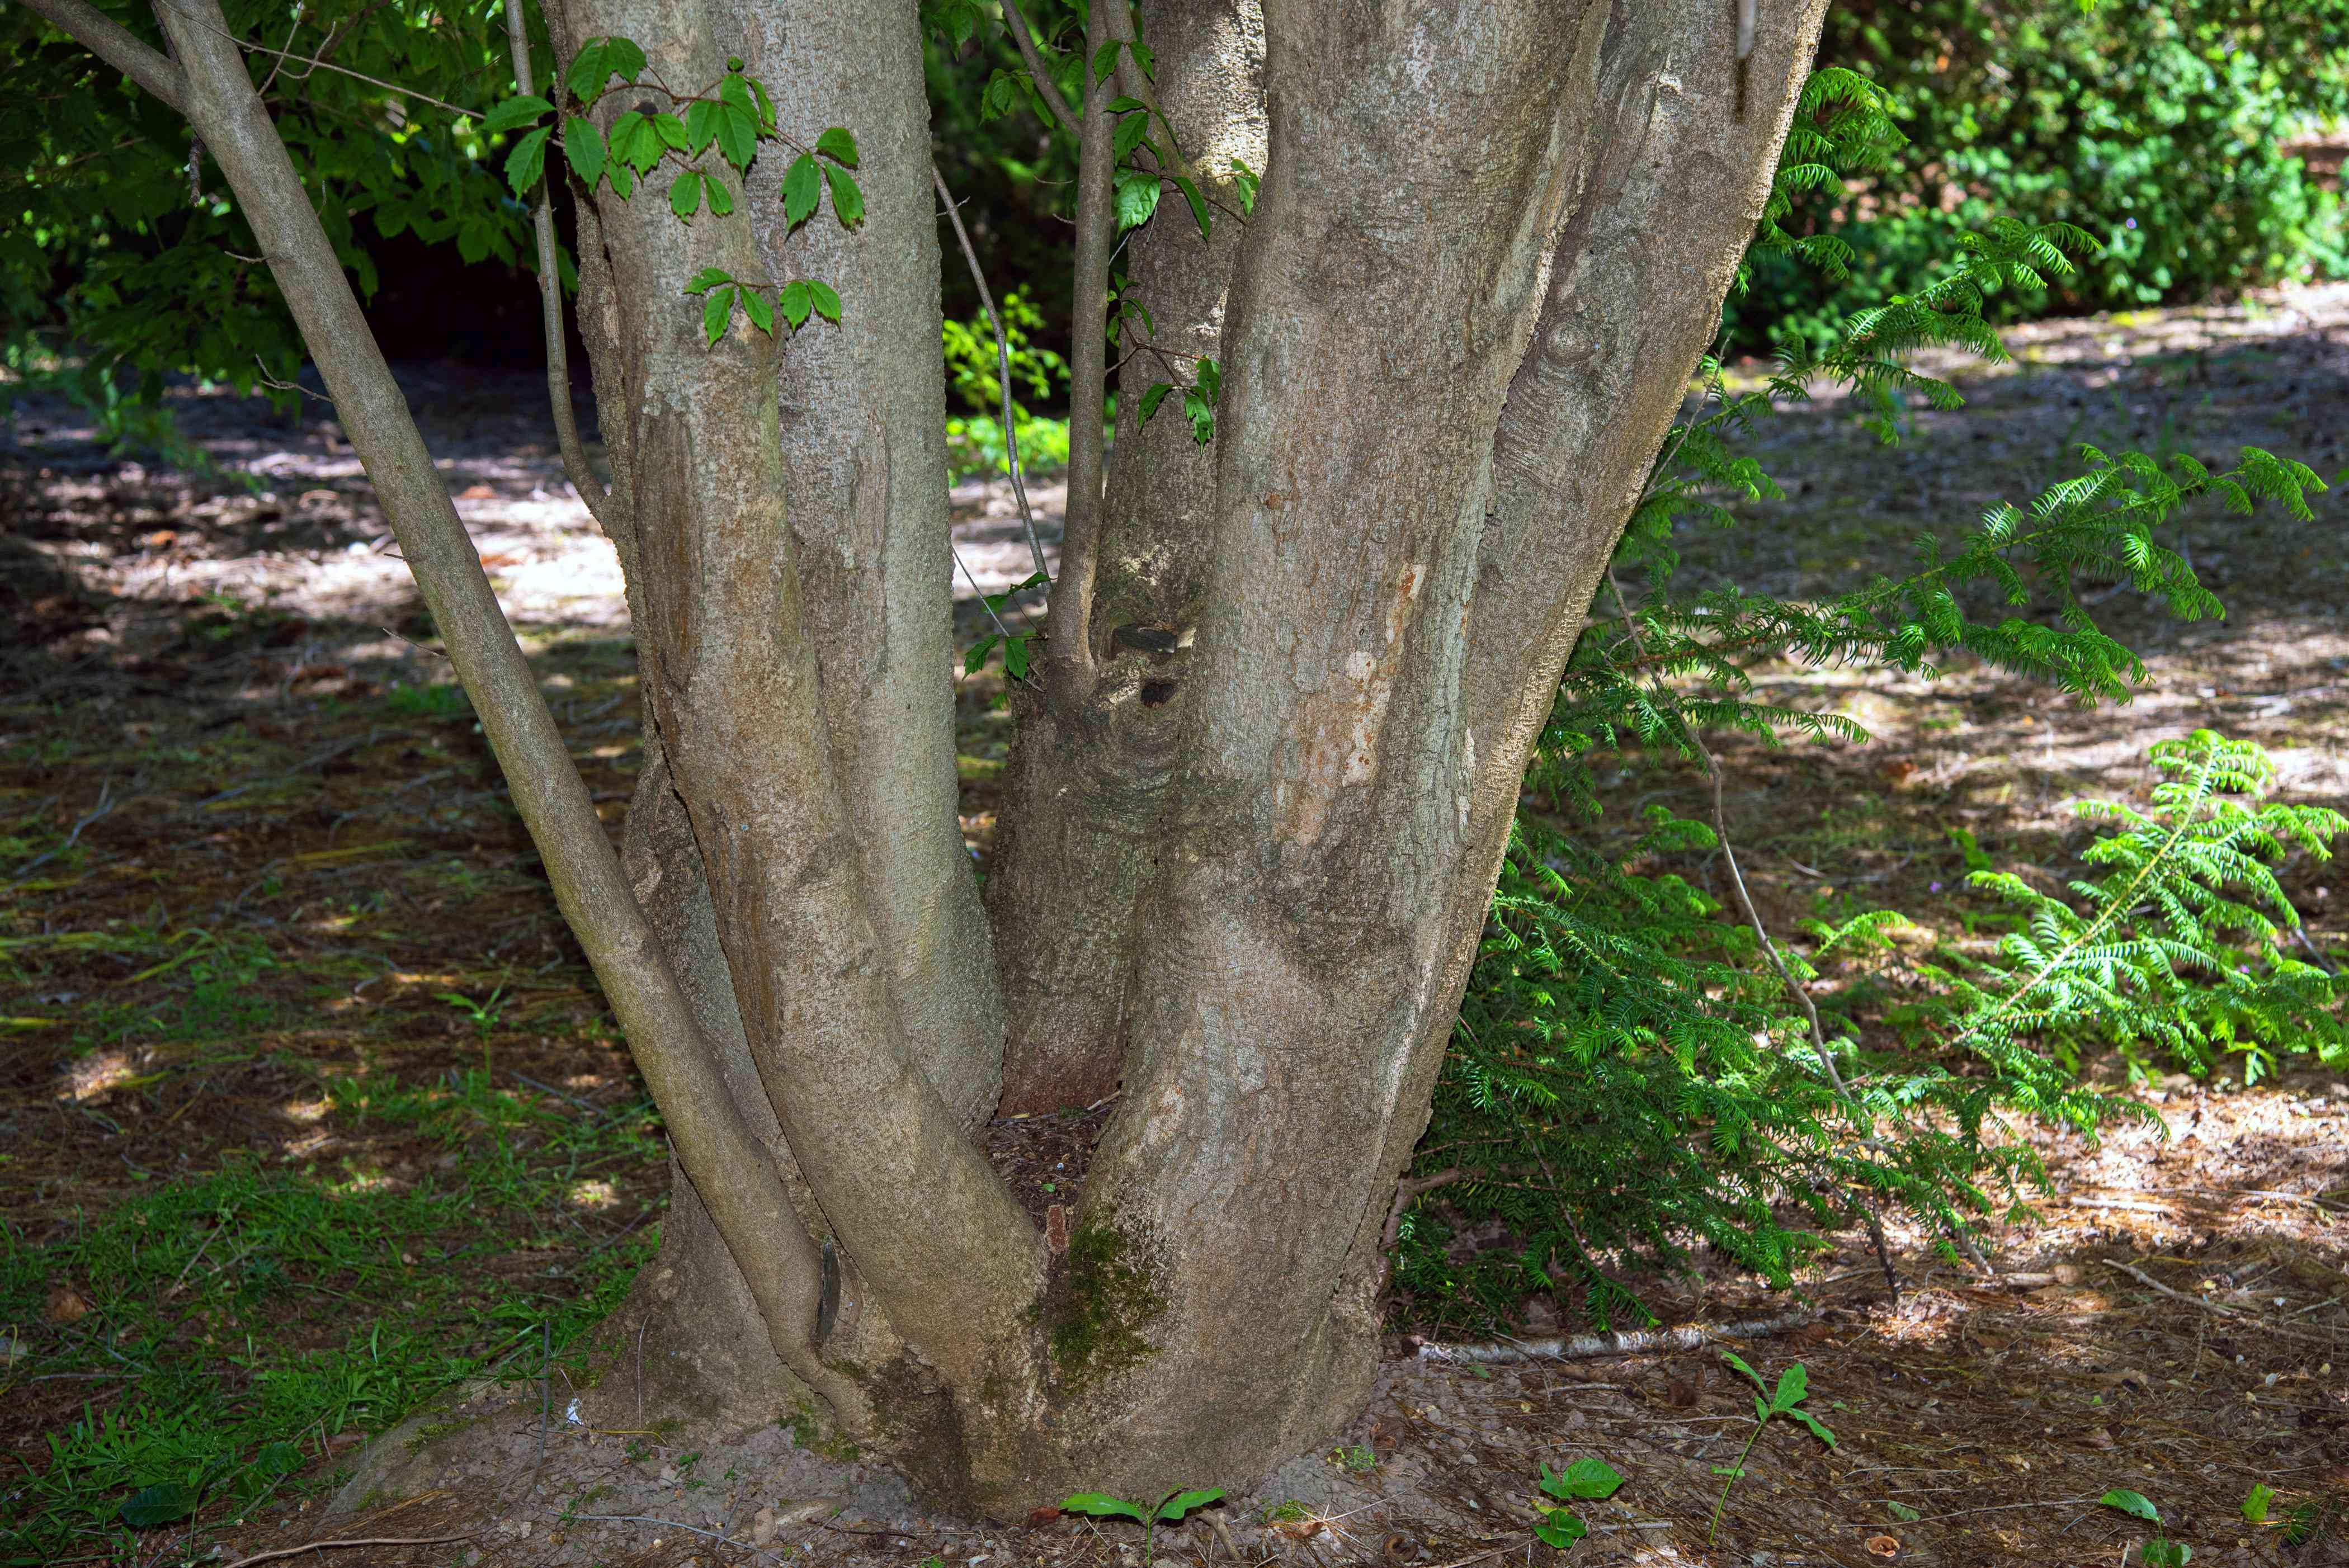 Vine leaf maple tree trunk closeup